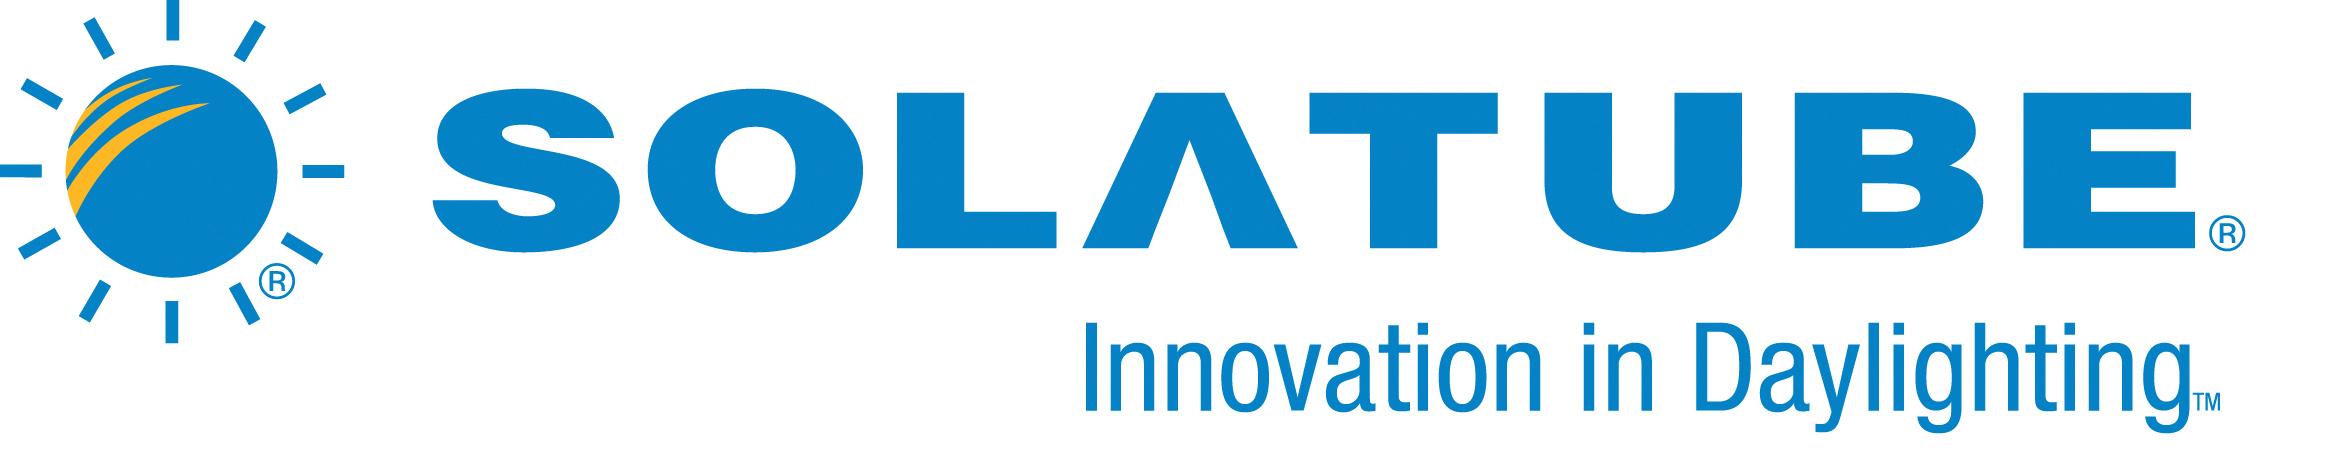 Solatube Logo.jpg